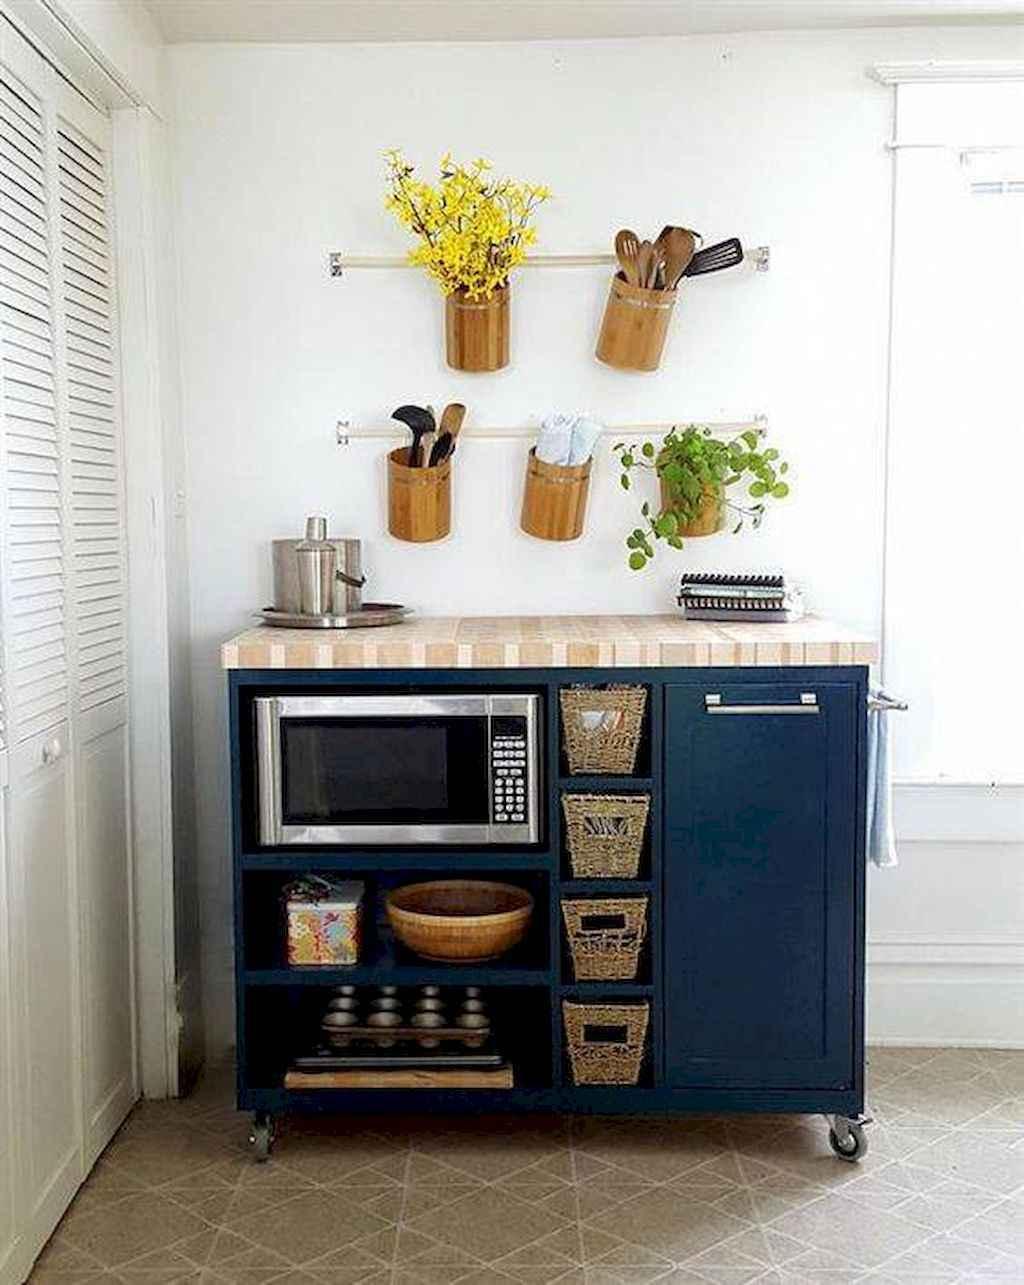 Small Apartment Balcony Garden Ideas: 50 Amazing Small Apartment Kitchen Decor Ideas (3